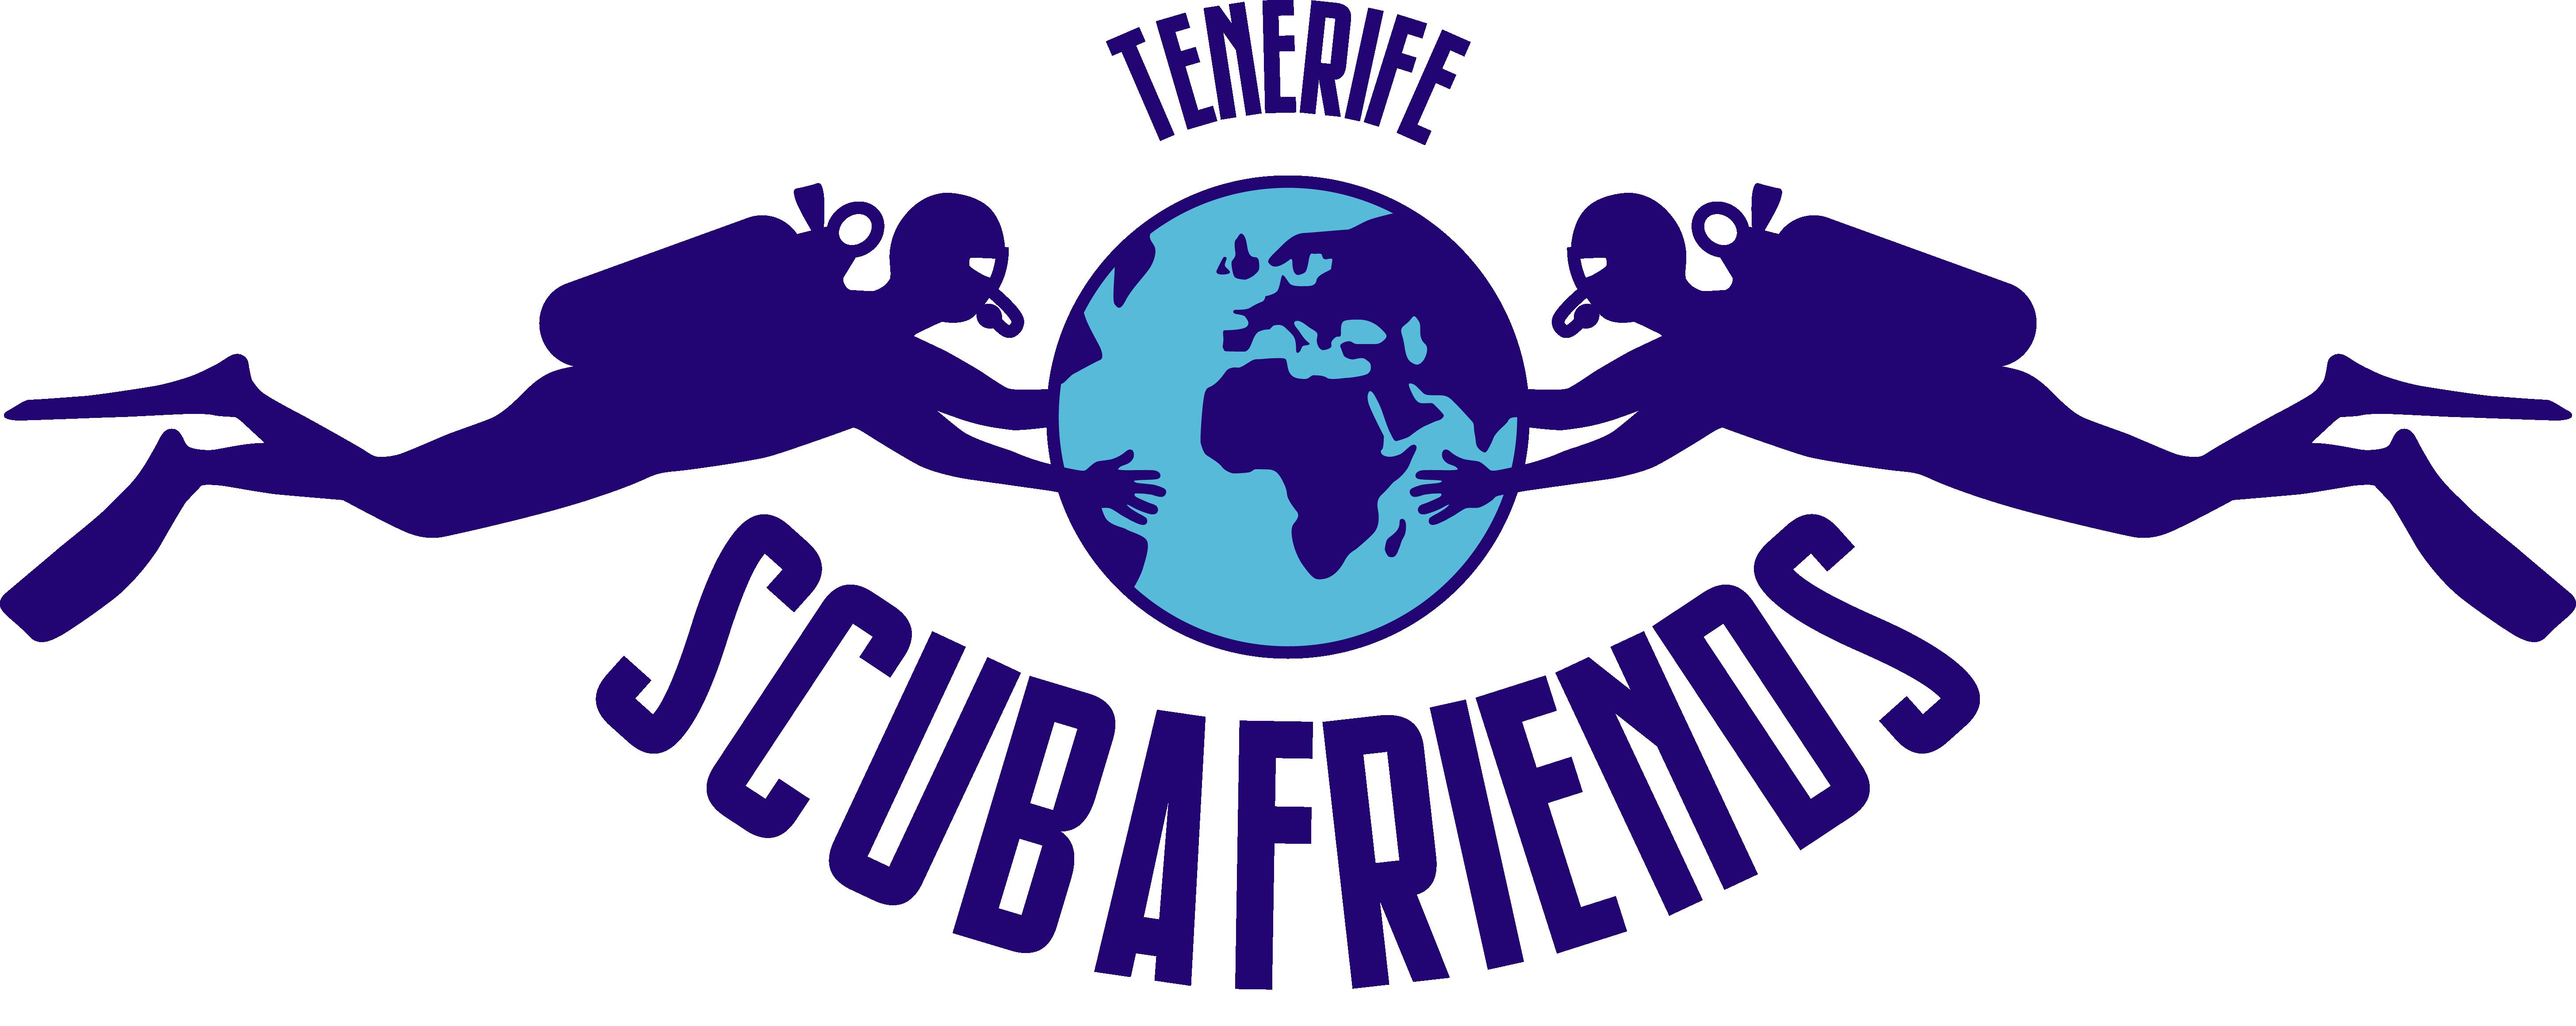 Scubafriends Tenerife